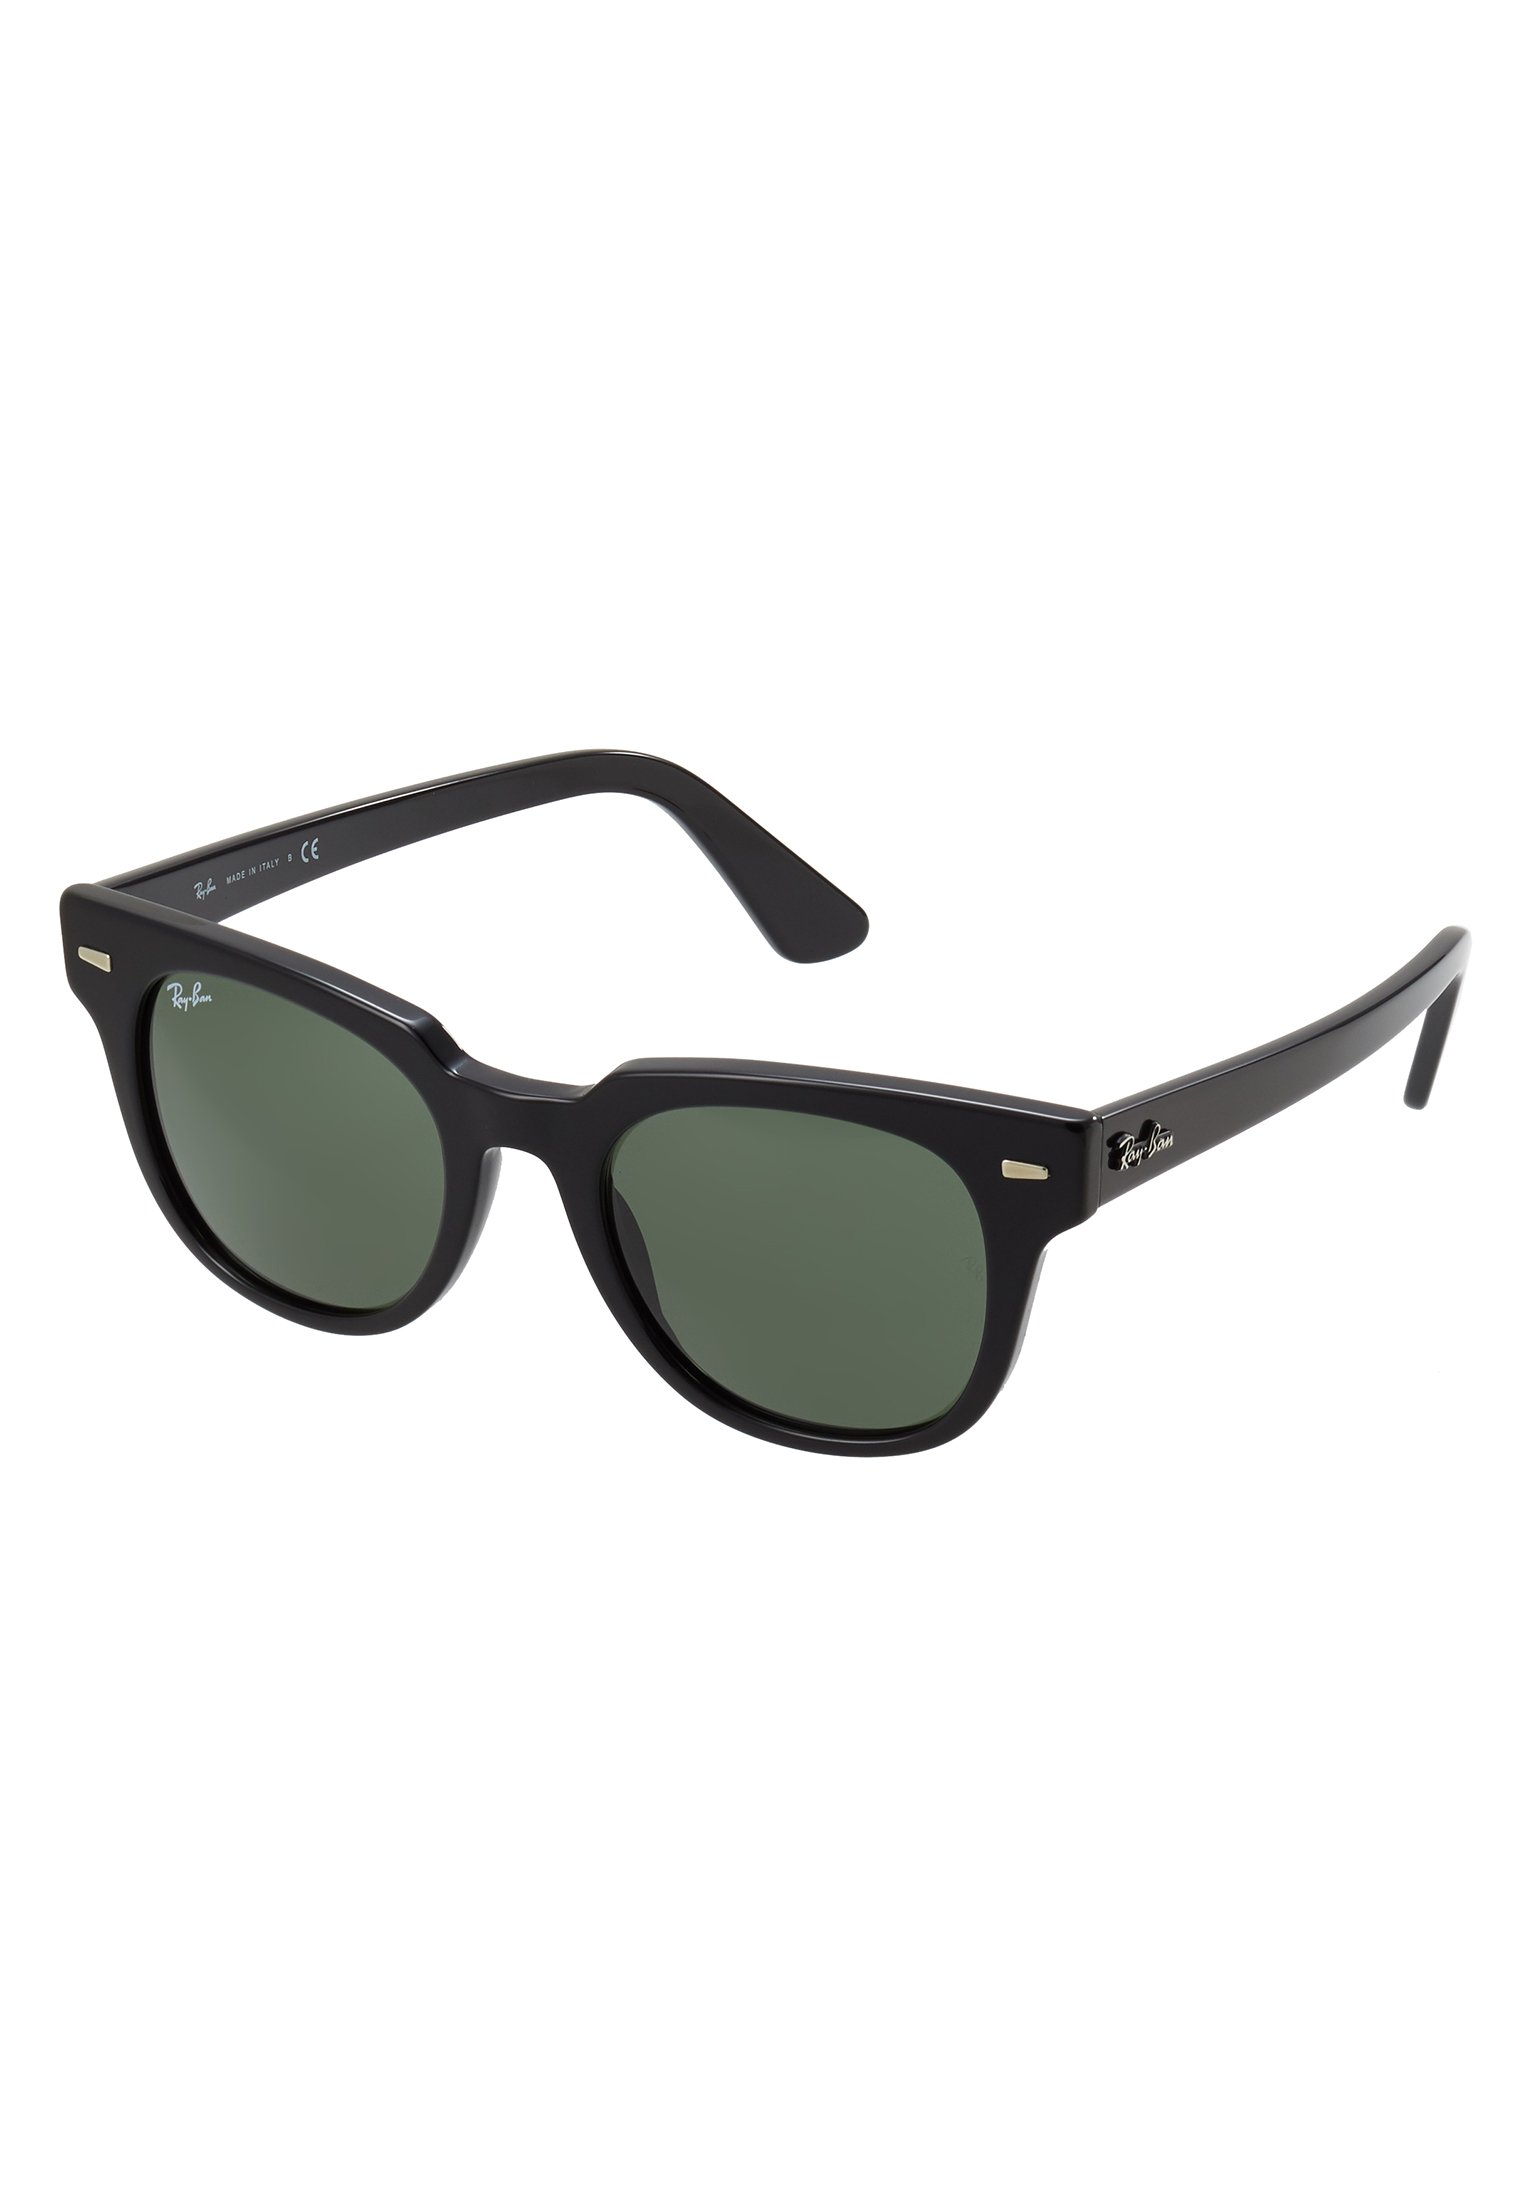 Ray-Ban METEOR - Solbriller - black/green/svart YsivvjpGUk3mTLc